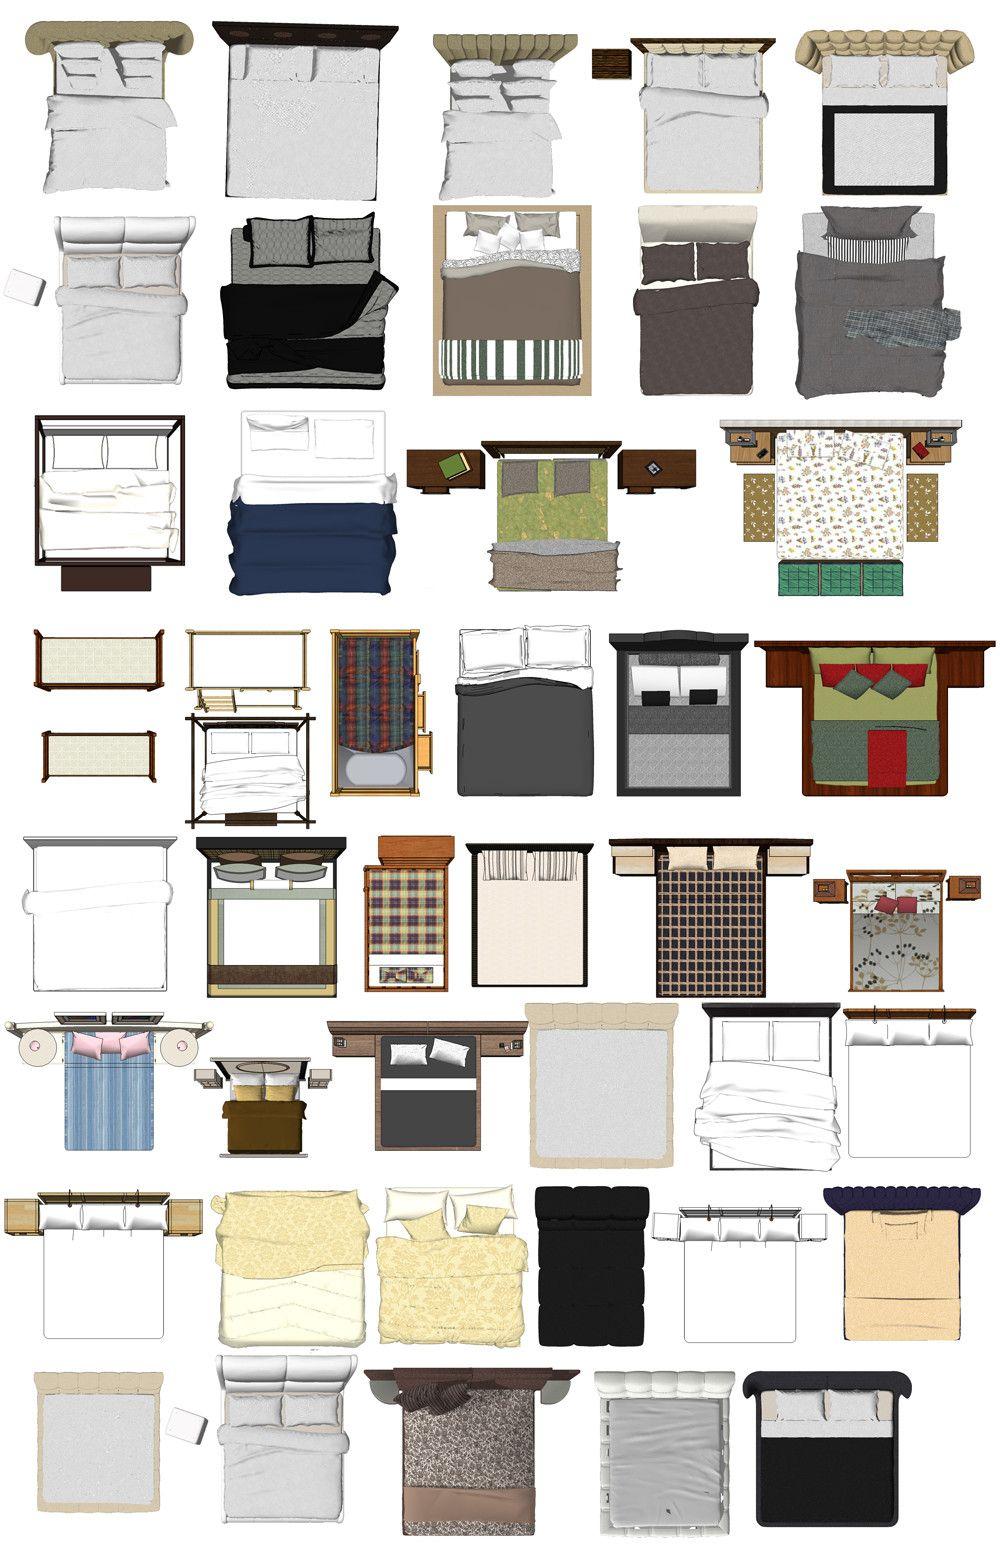 Photoshop Psd Bed Blocks 2 Bed Blocks Floor Plan Drawing